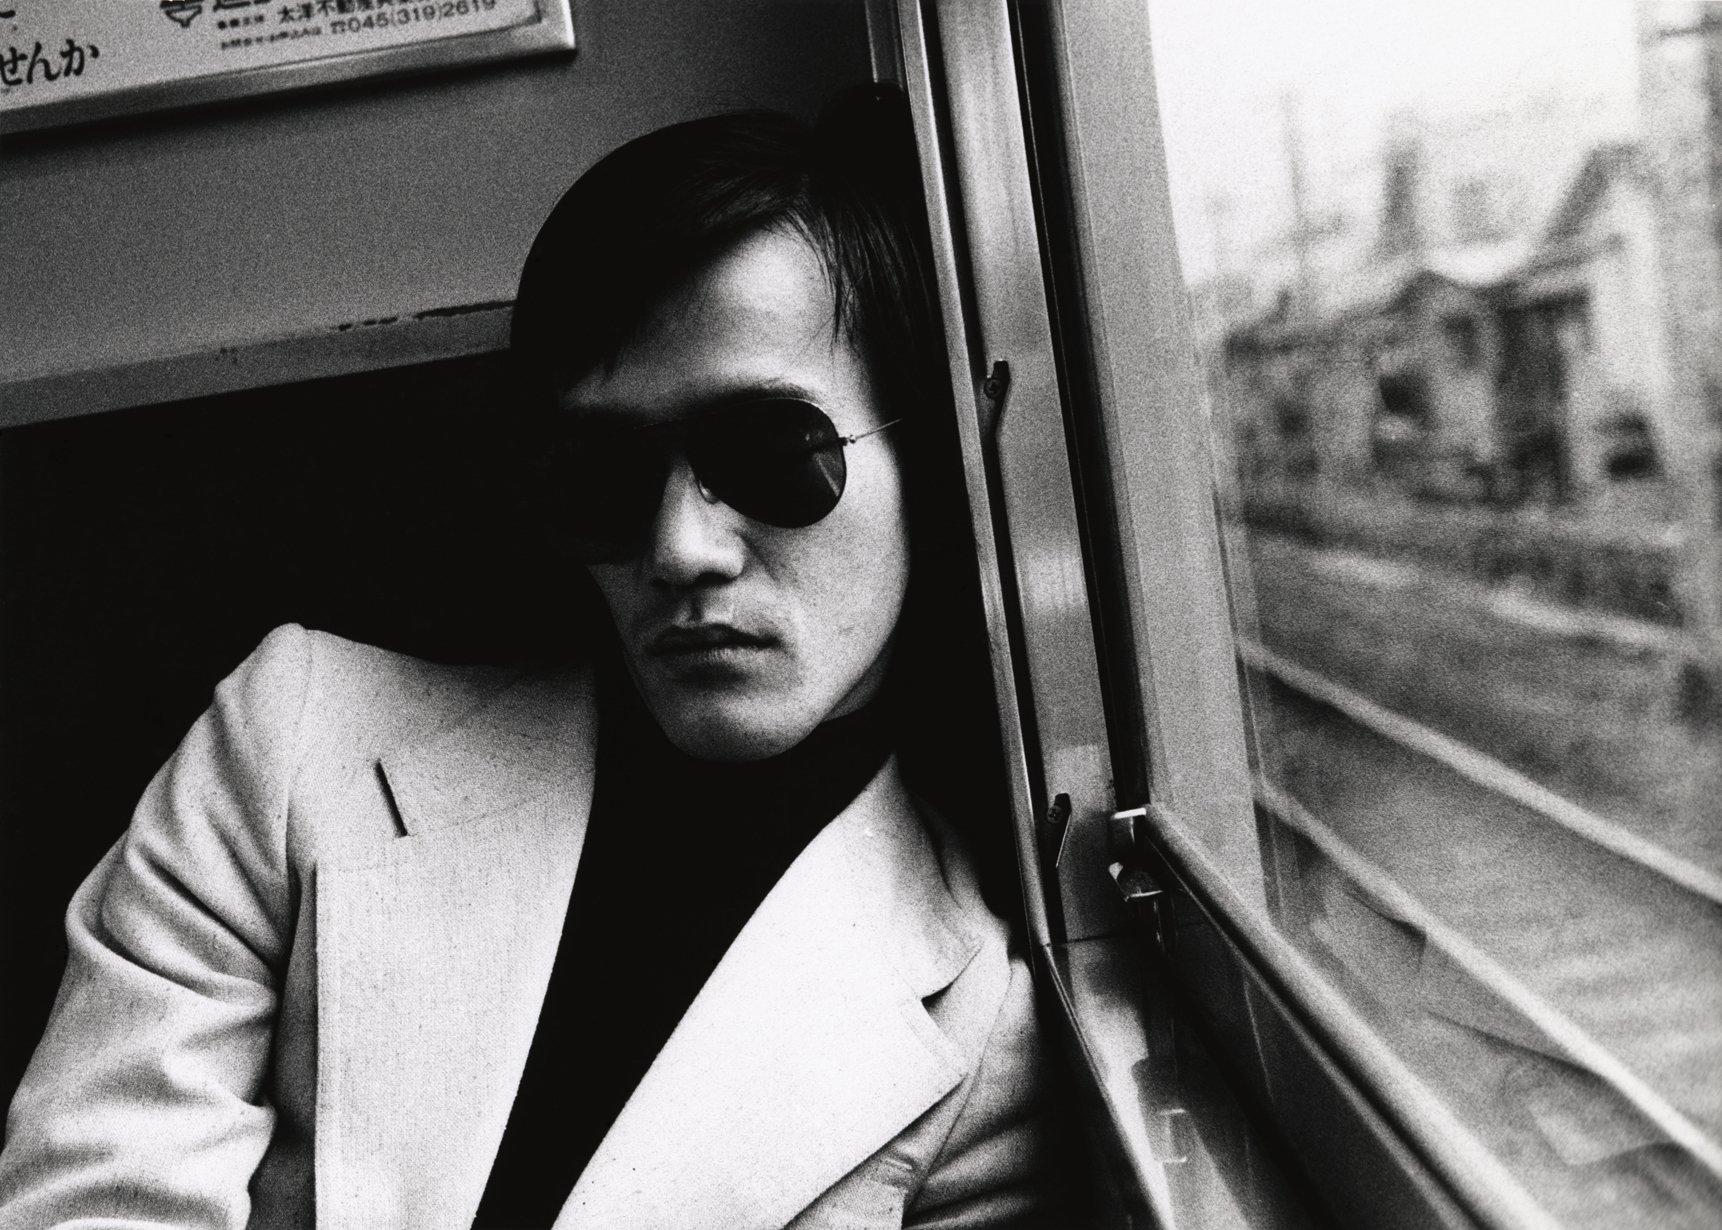 Uomo sul treno Fotografia in bianco e nero Daidō Moriyama